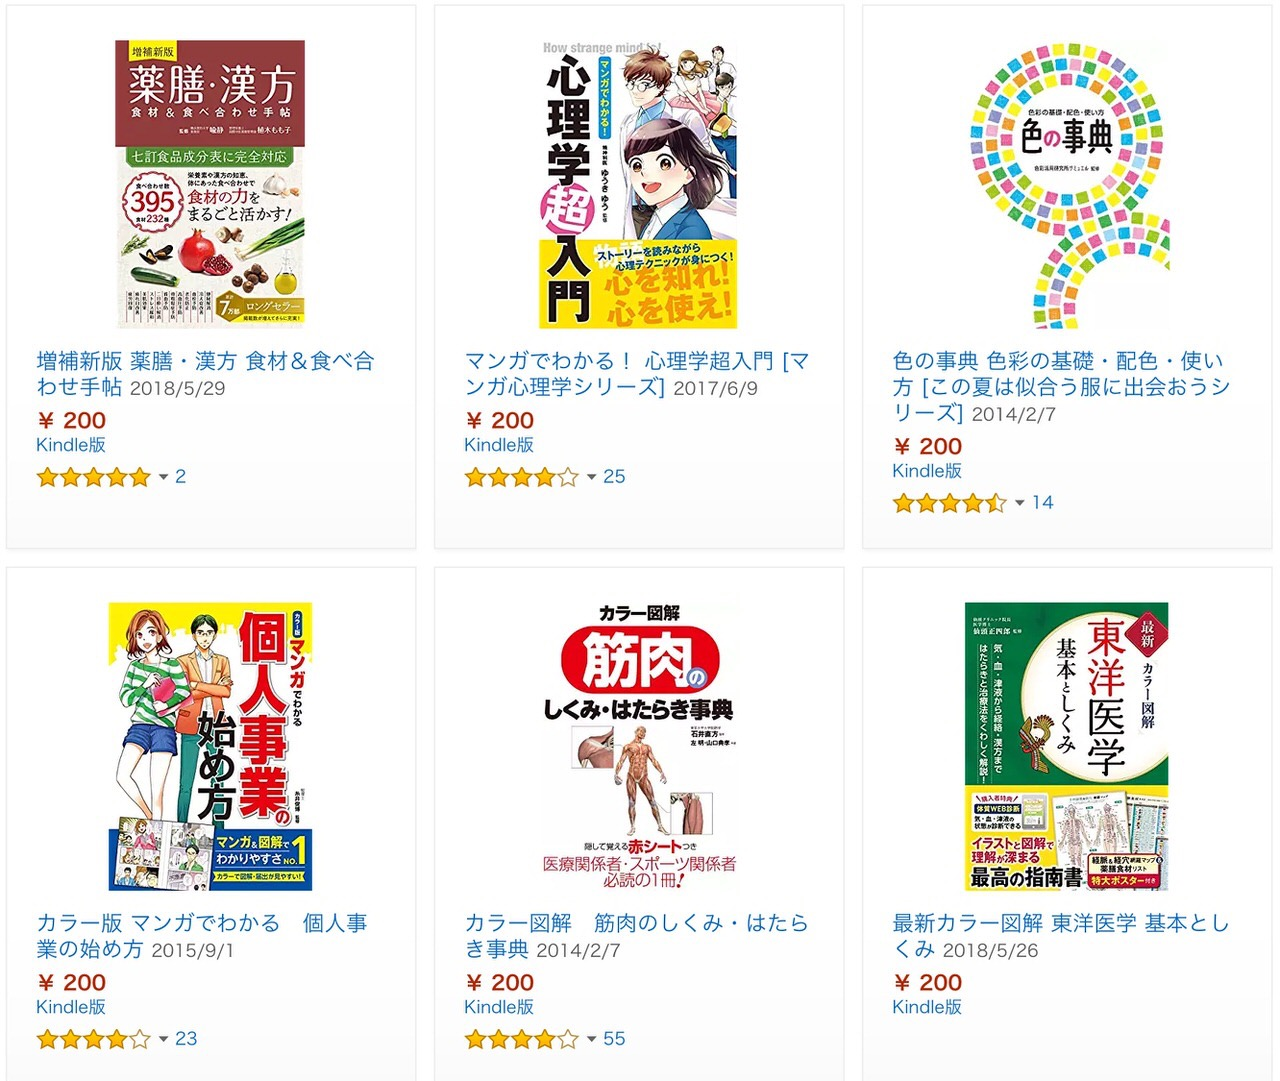 【Kindleセール】59%以上「オール199円大セール!」(10/19まで)